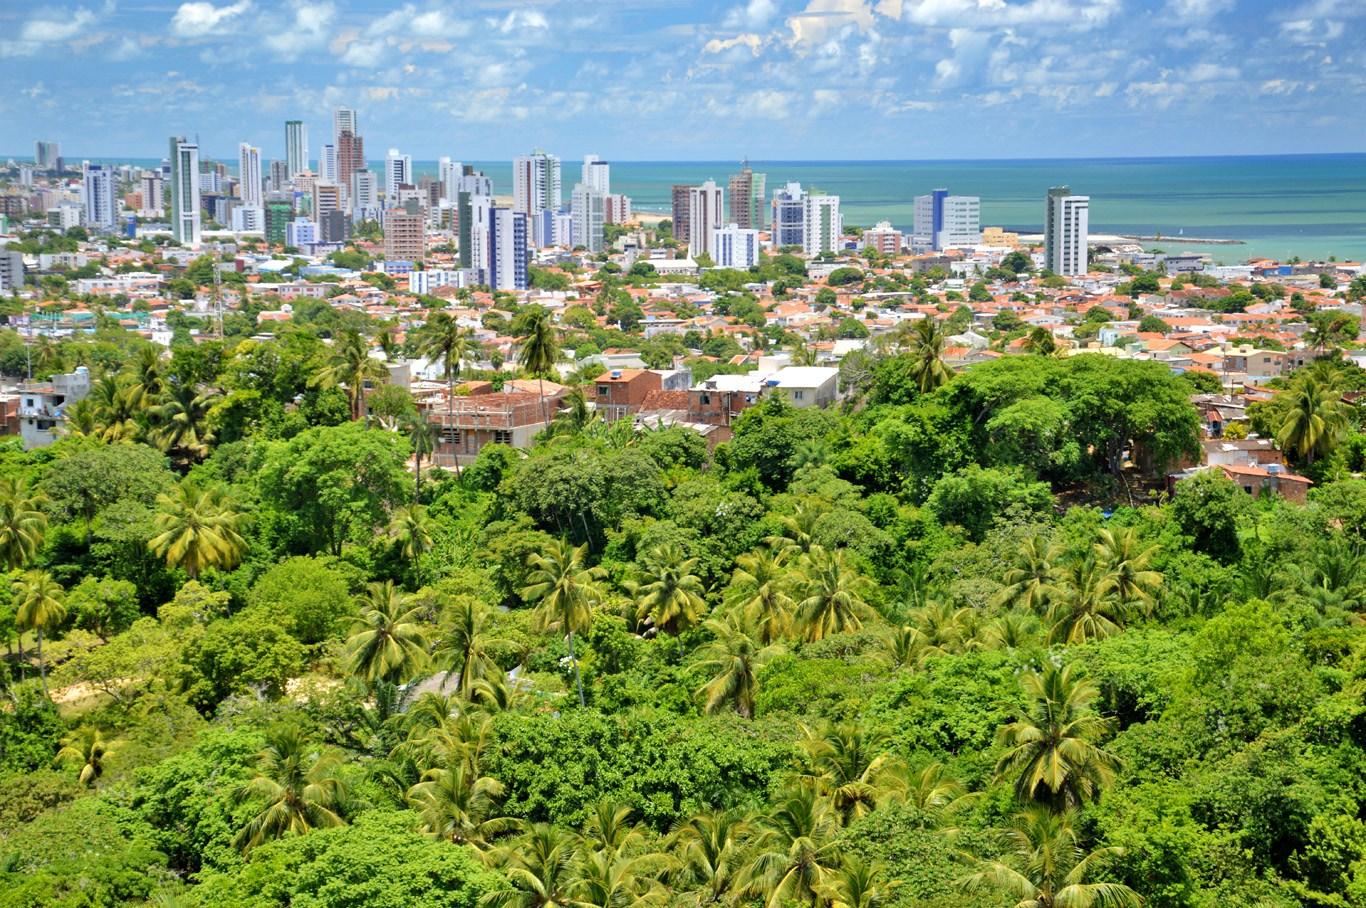 View of modern part of Olinda